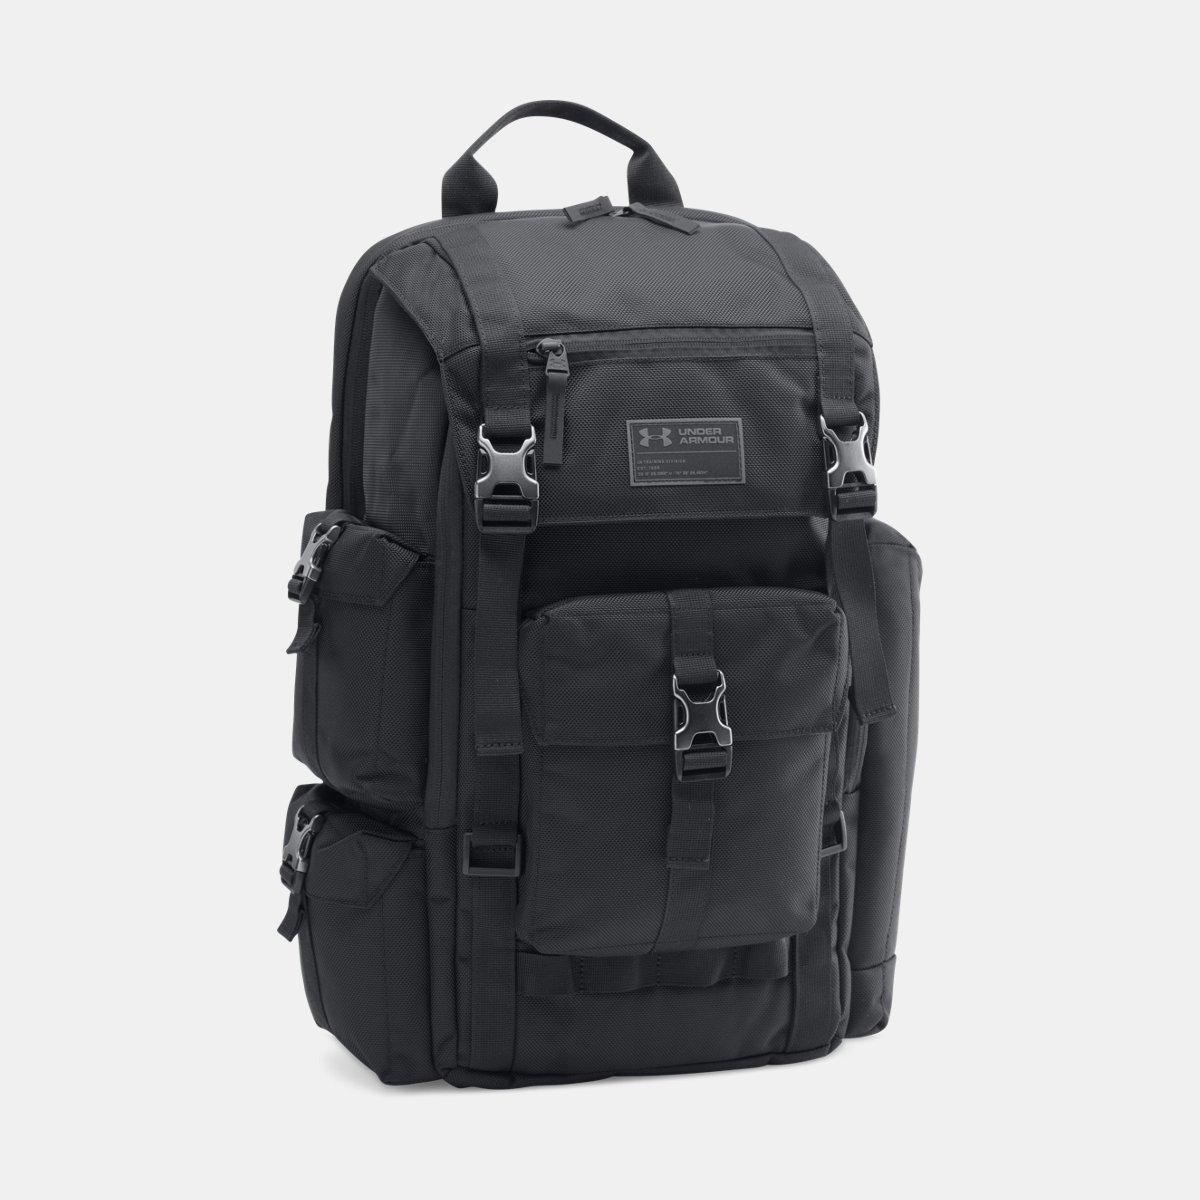 [UNDER ARMOUR] アンダーアーマー Men's UA CORDURA Regiment Backpack [並行輸入品]  ブラック B0753DG4ZY